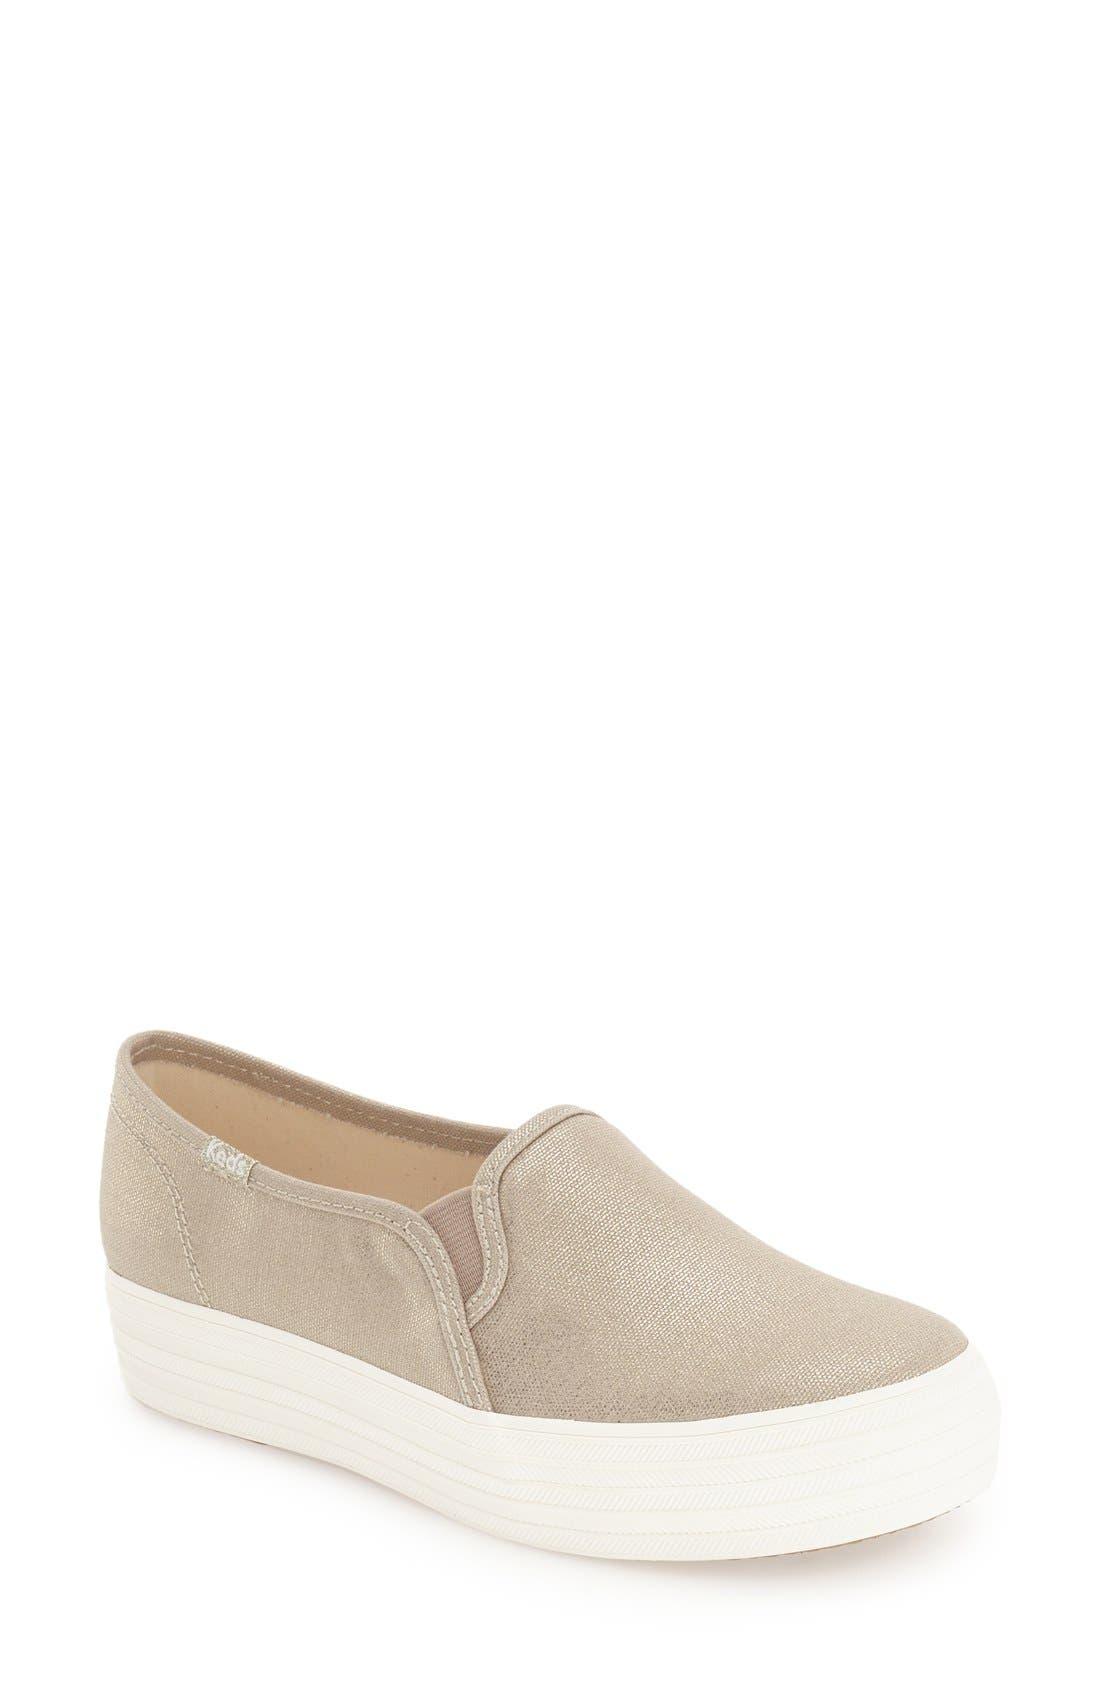 Alternate Image 1 Selected - Keds® 'Triple Decker - Metallic' Slip-On Platform Sneaker (Women)